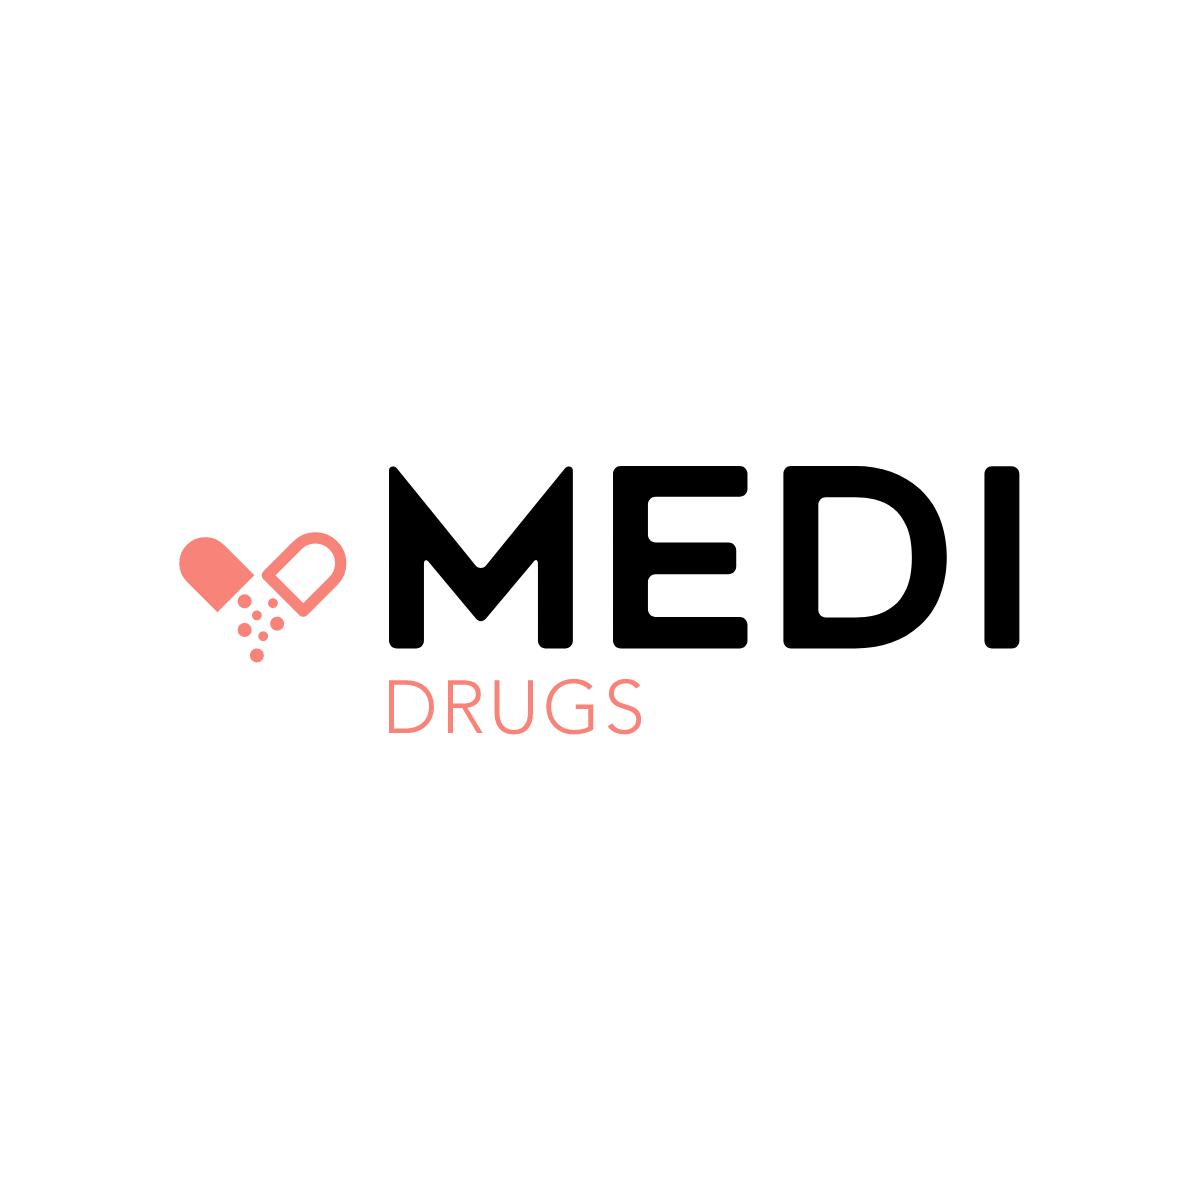 Illustration of Medi Drugs